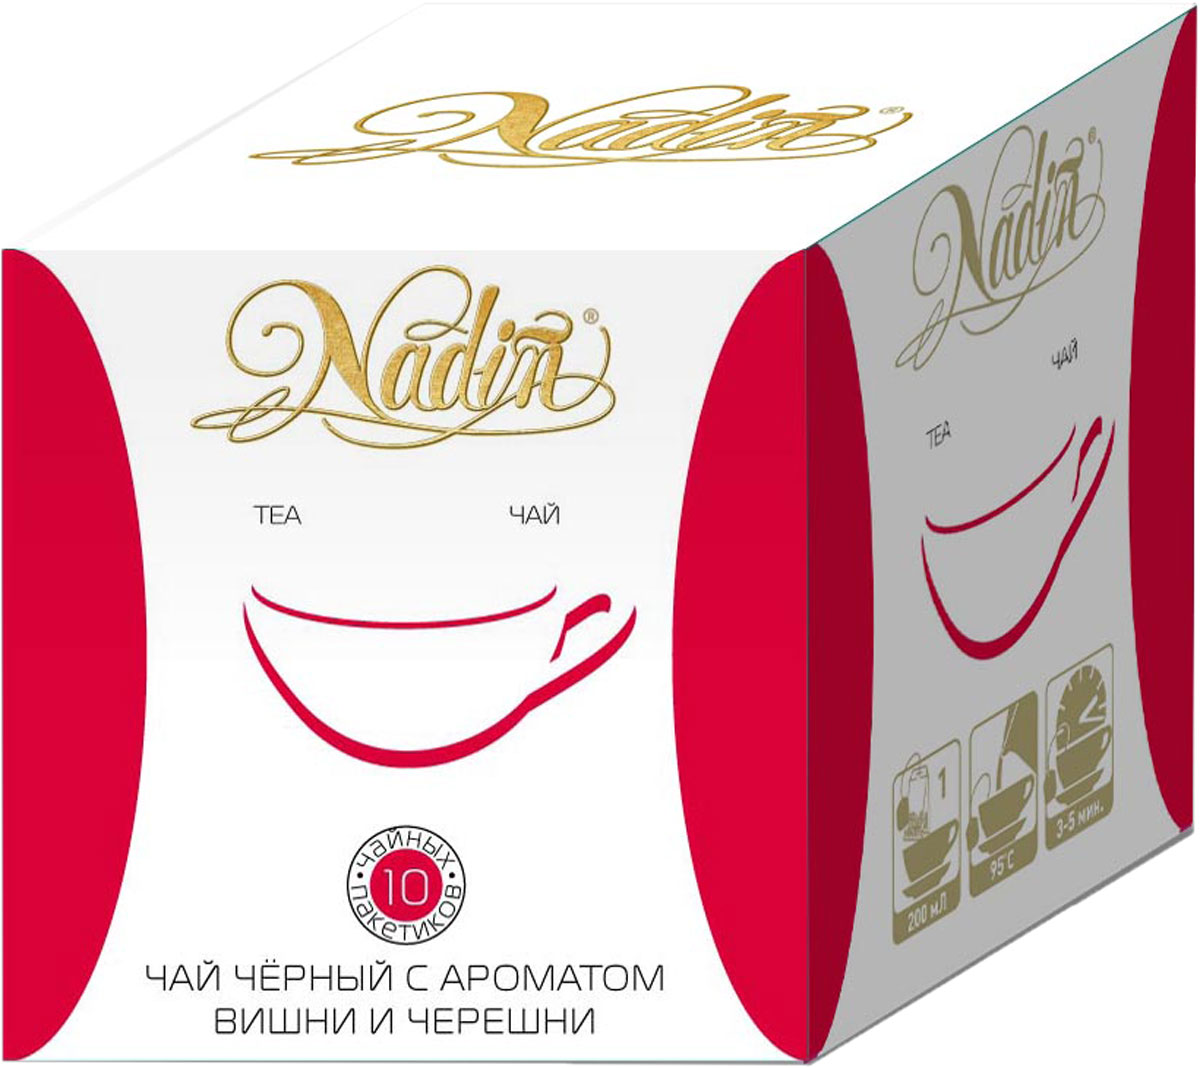 Nadin Вишня-Черешня чай черный пакетированный, 10 шт nadin лимон мята чай черный пакетированный 10 шт